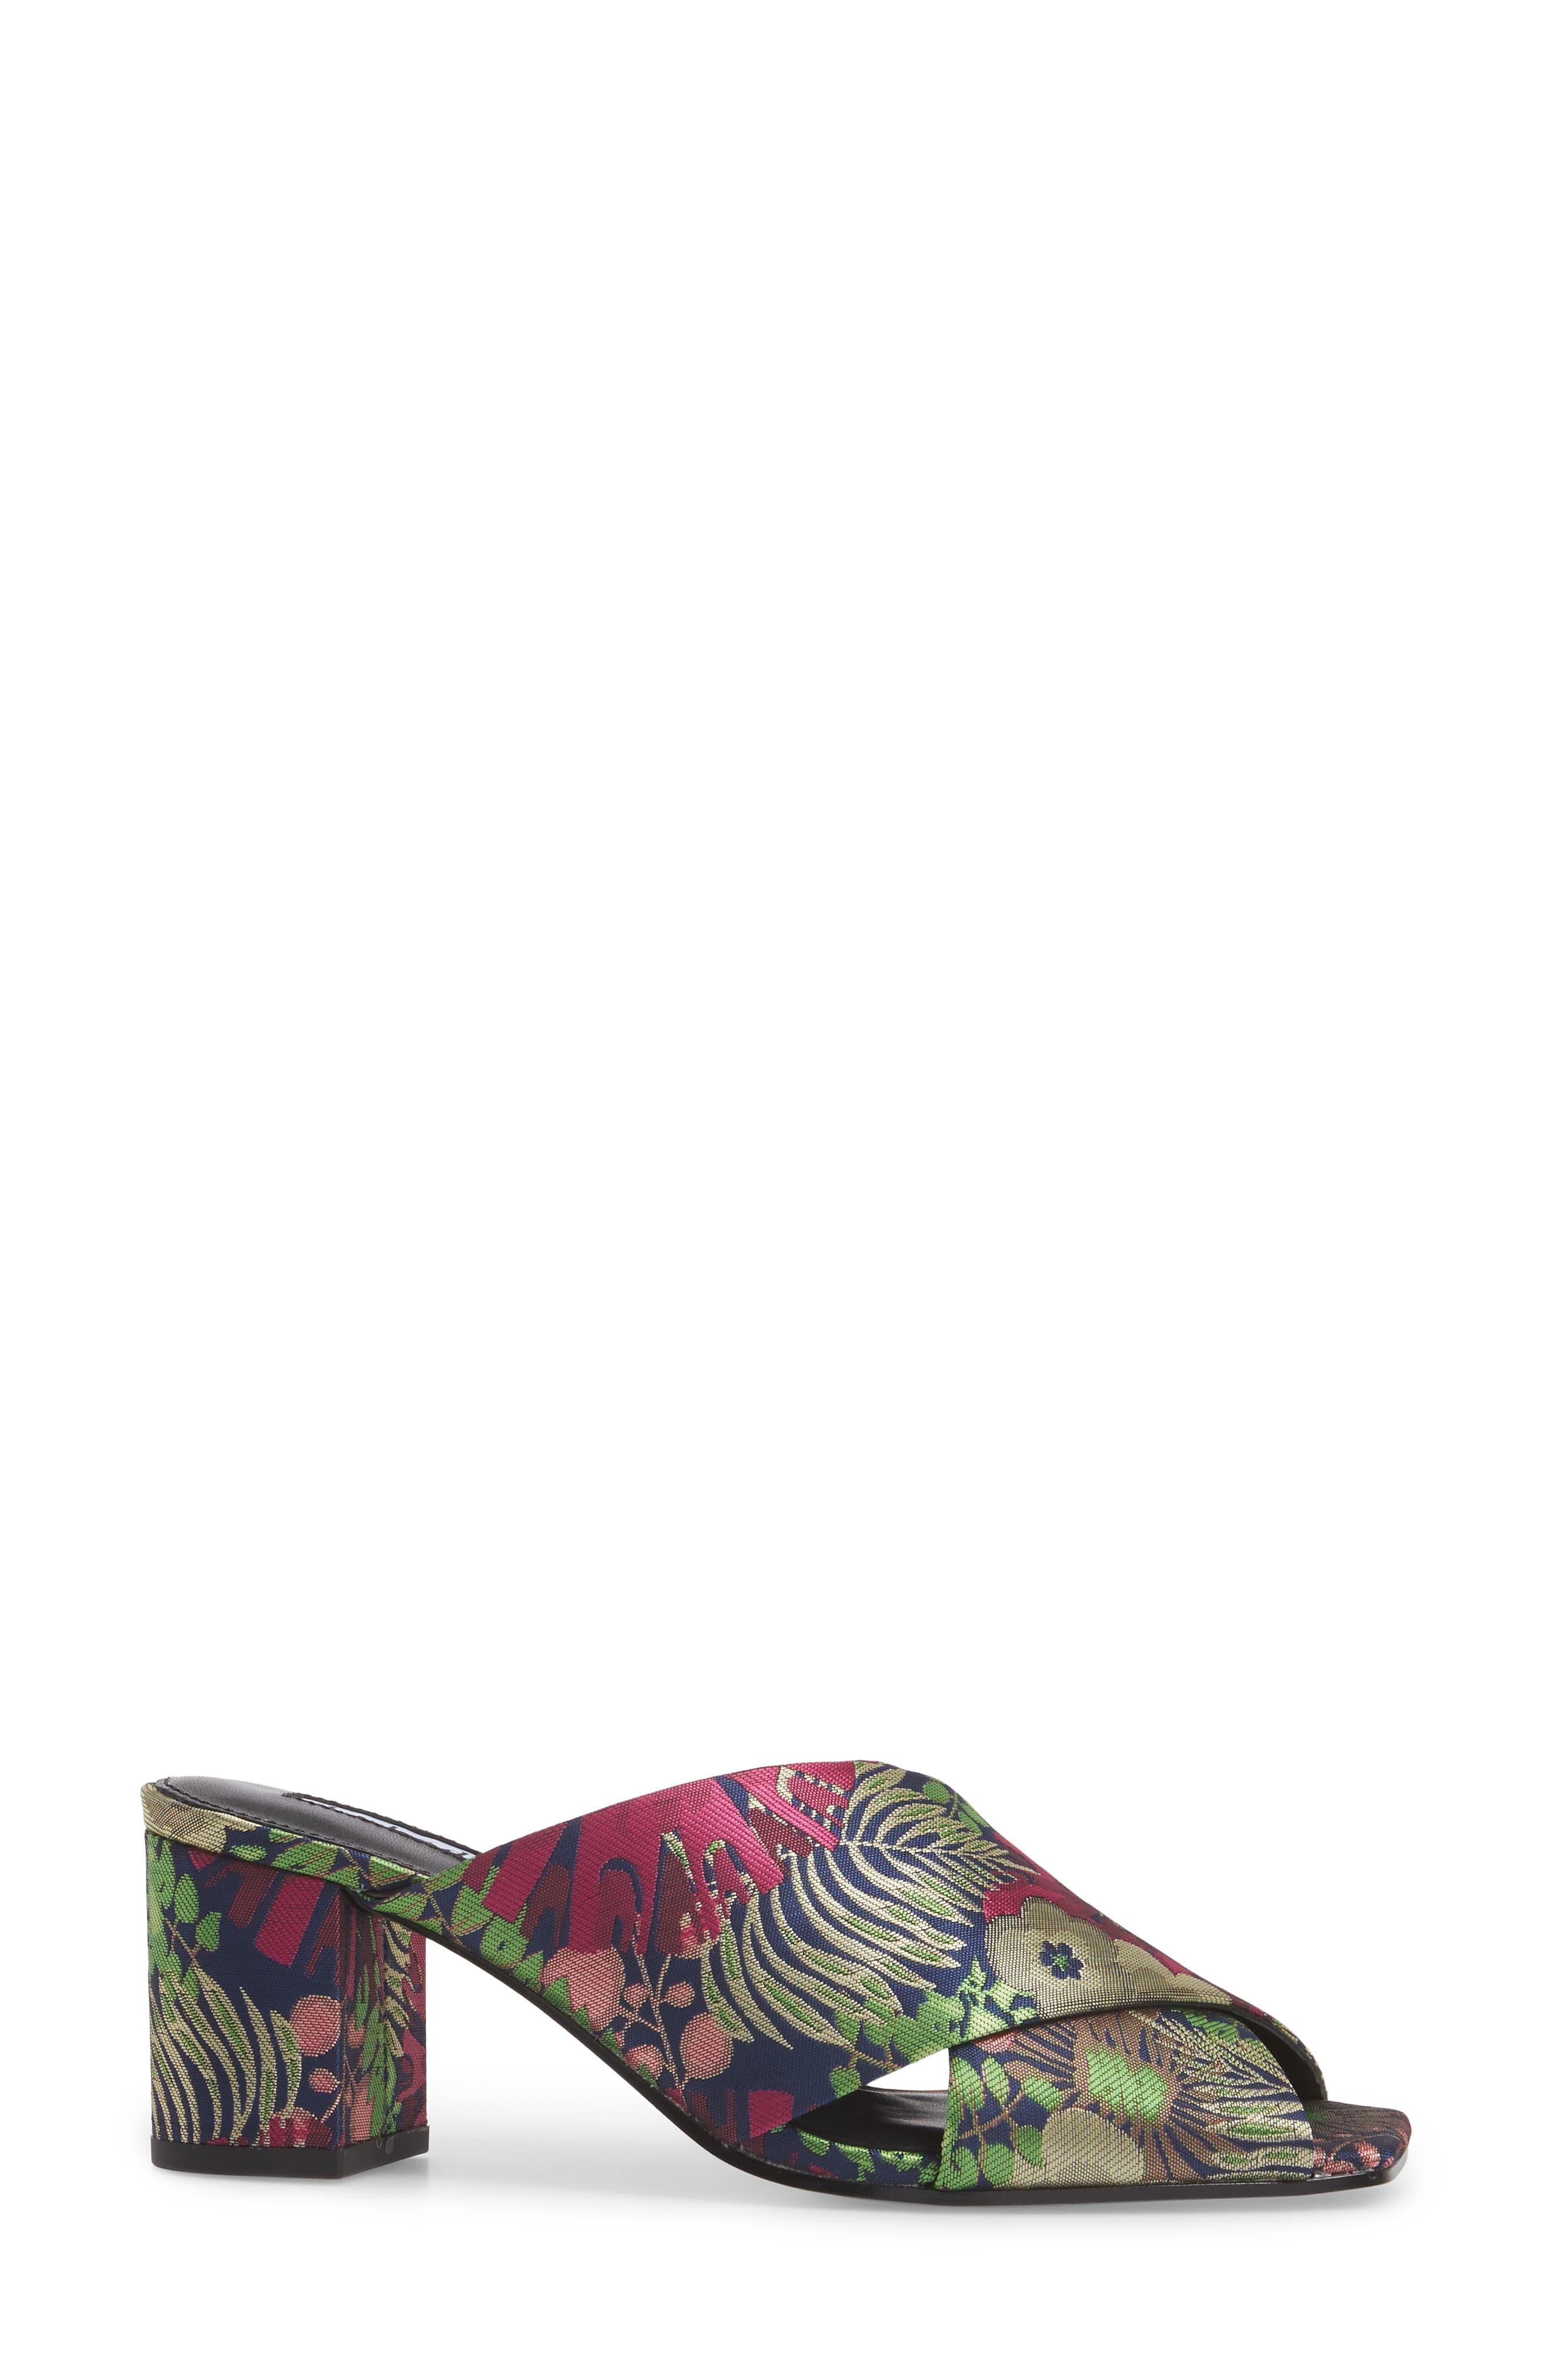 Crissaly Slide Sandal,                             Alternate thumbnail 3, color,                             GREEN MULTI FLORAL FABRIC